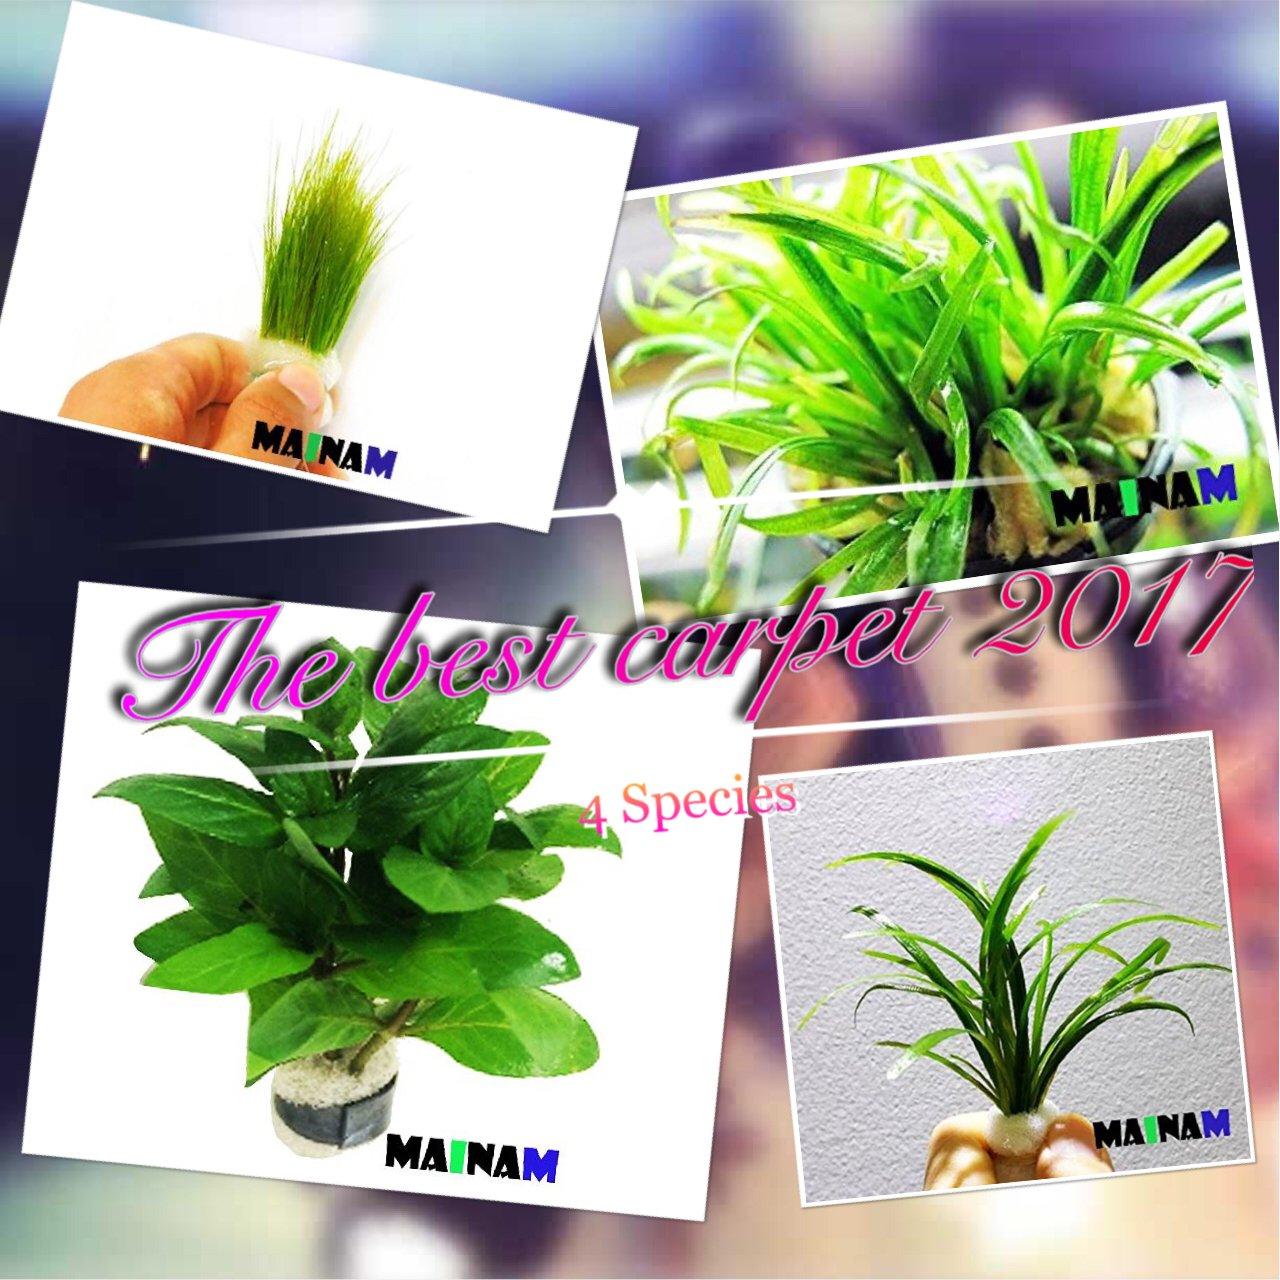 Mainam Live Aquarium Plants The Best 2017/4 Species - Dwarf Hairgrass, Micro Sword, Dwarf Sagittaria Subulata and Staurogyne Repens by Mainam